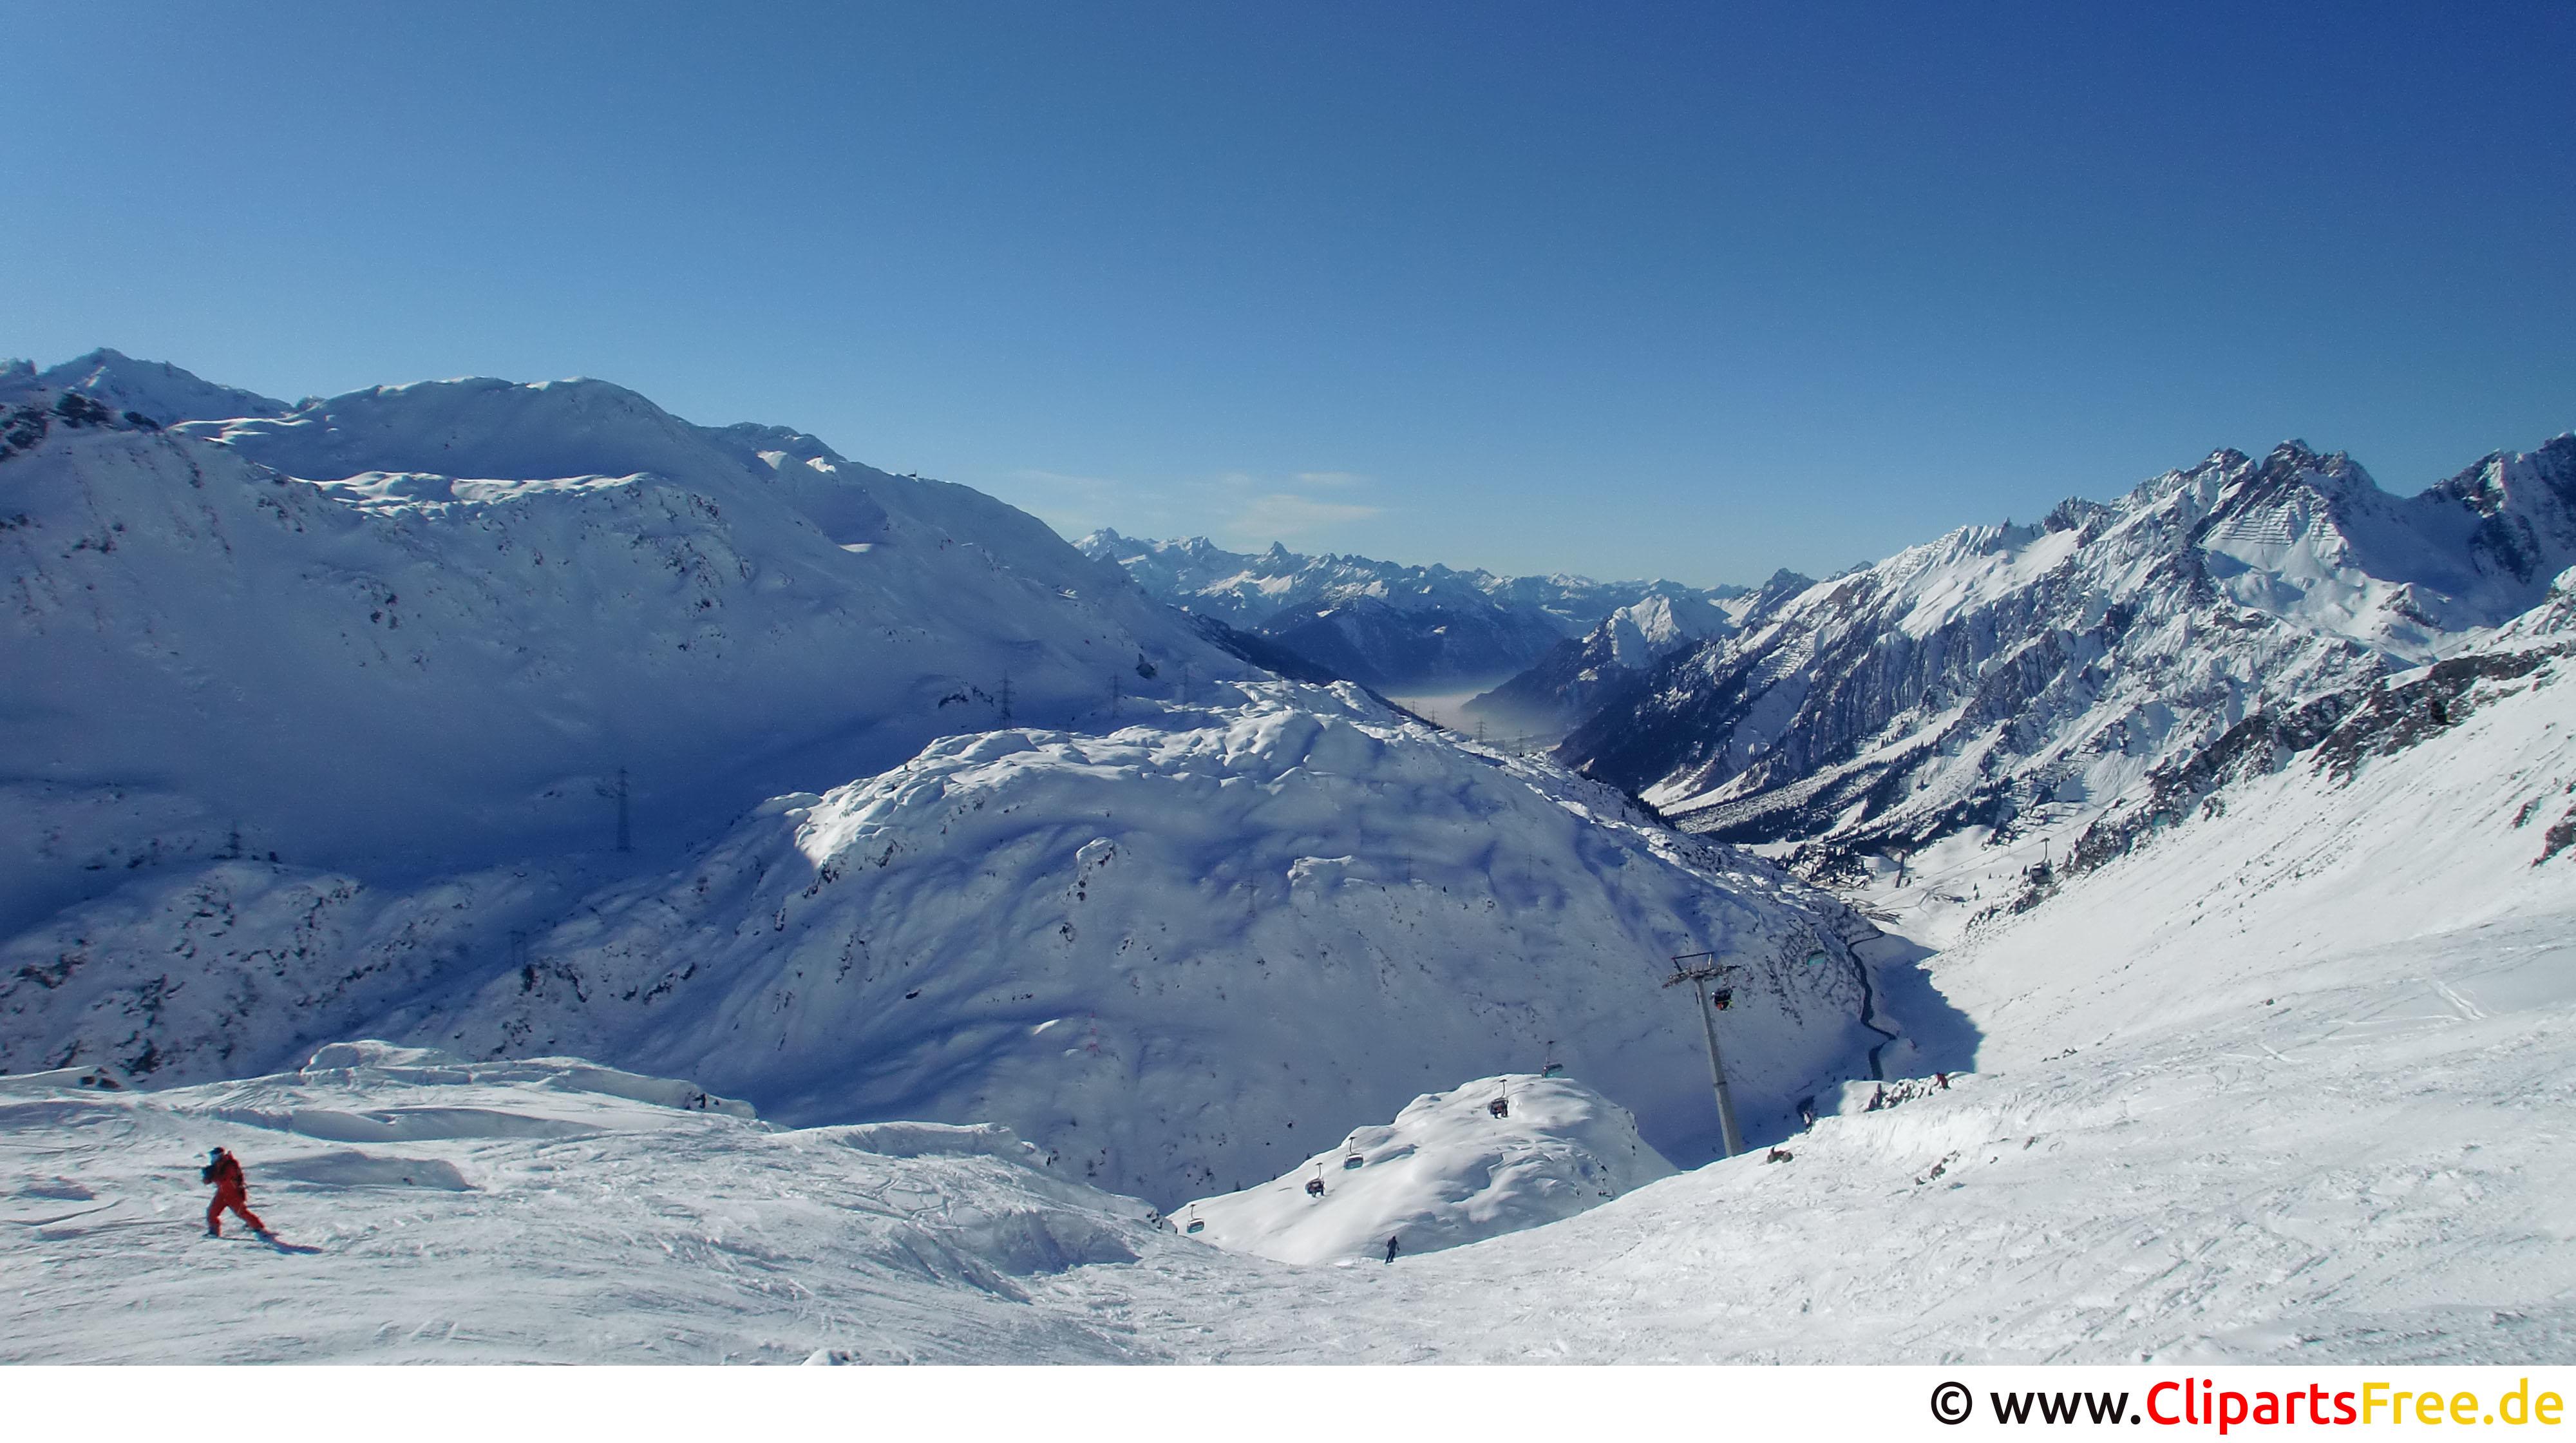 Skigebiet Bild, Foto, Grafik kostenlos